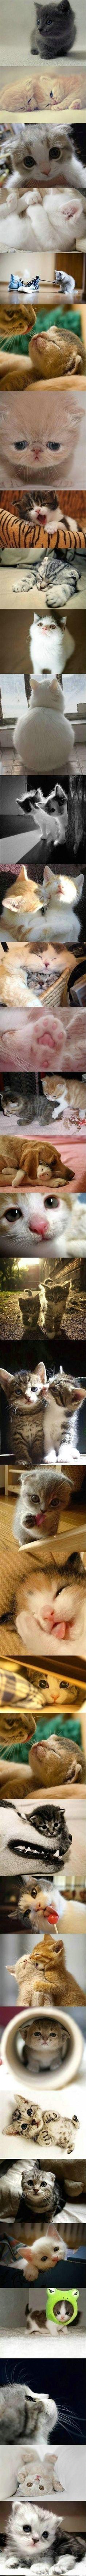 Kittens Galore!